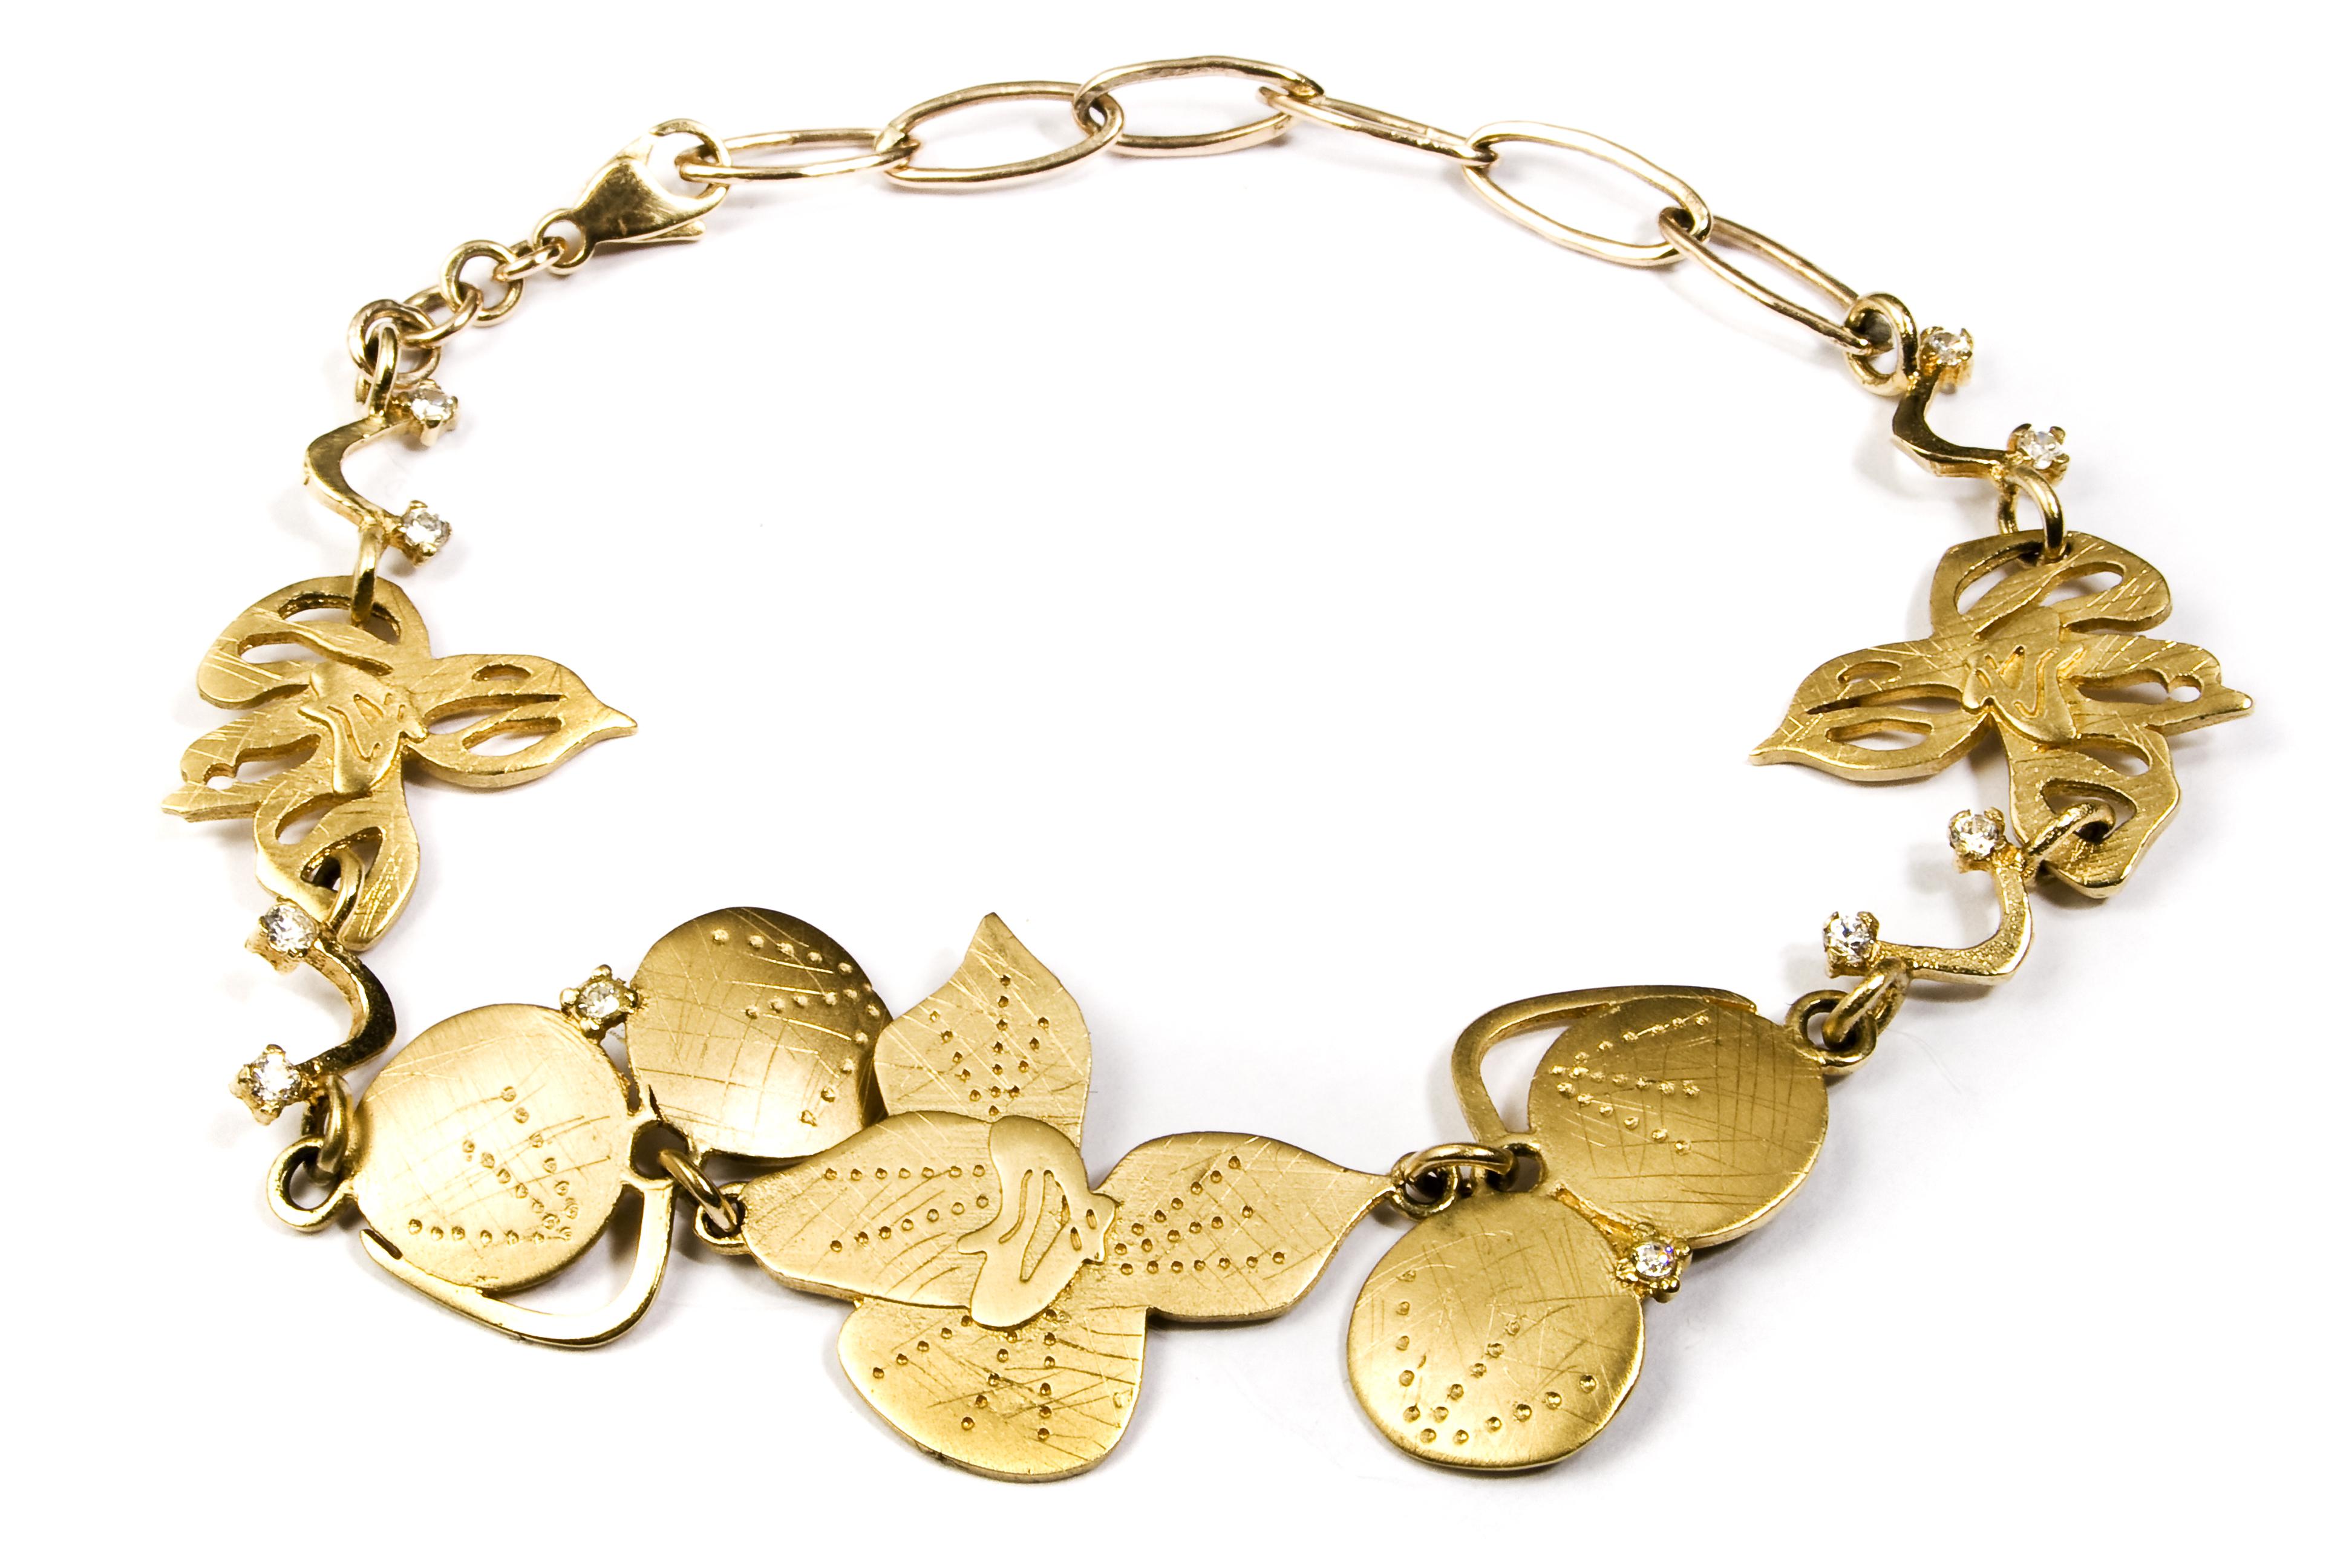 Luxury Jewelry  Bel Esprit's Beautiful World. Authentic Gold Chains. Lab Diamond Earrings. 3 Stone Anniversary Band. Antique Watches. Jewelry Websites. Platinum Wedding Band Price. Dubai Engagement Rings. Heat Diamond